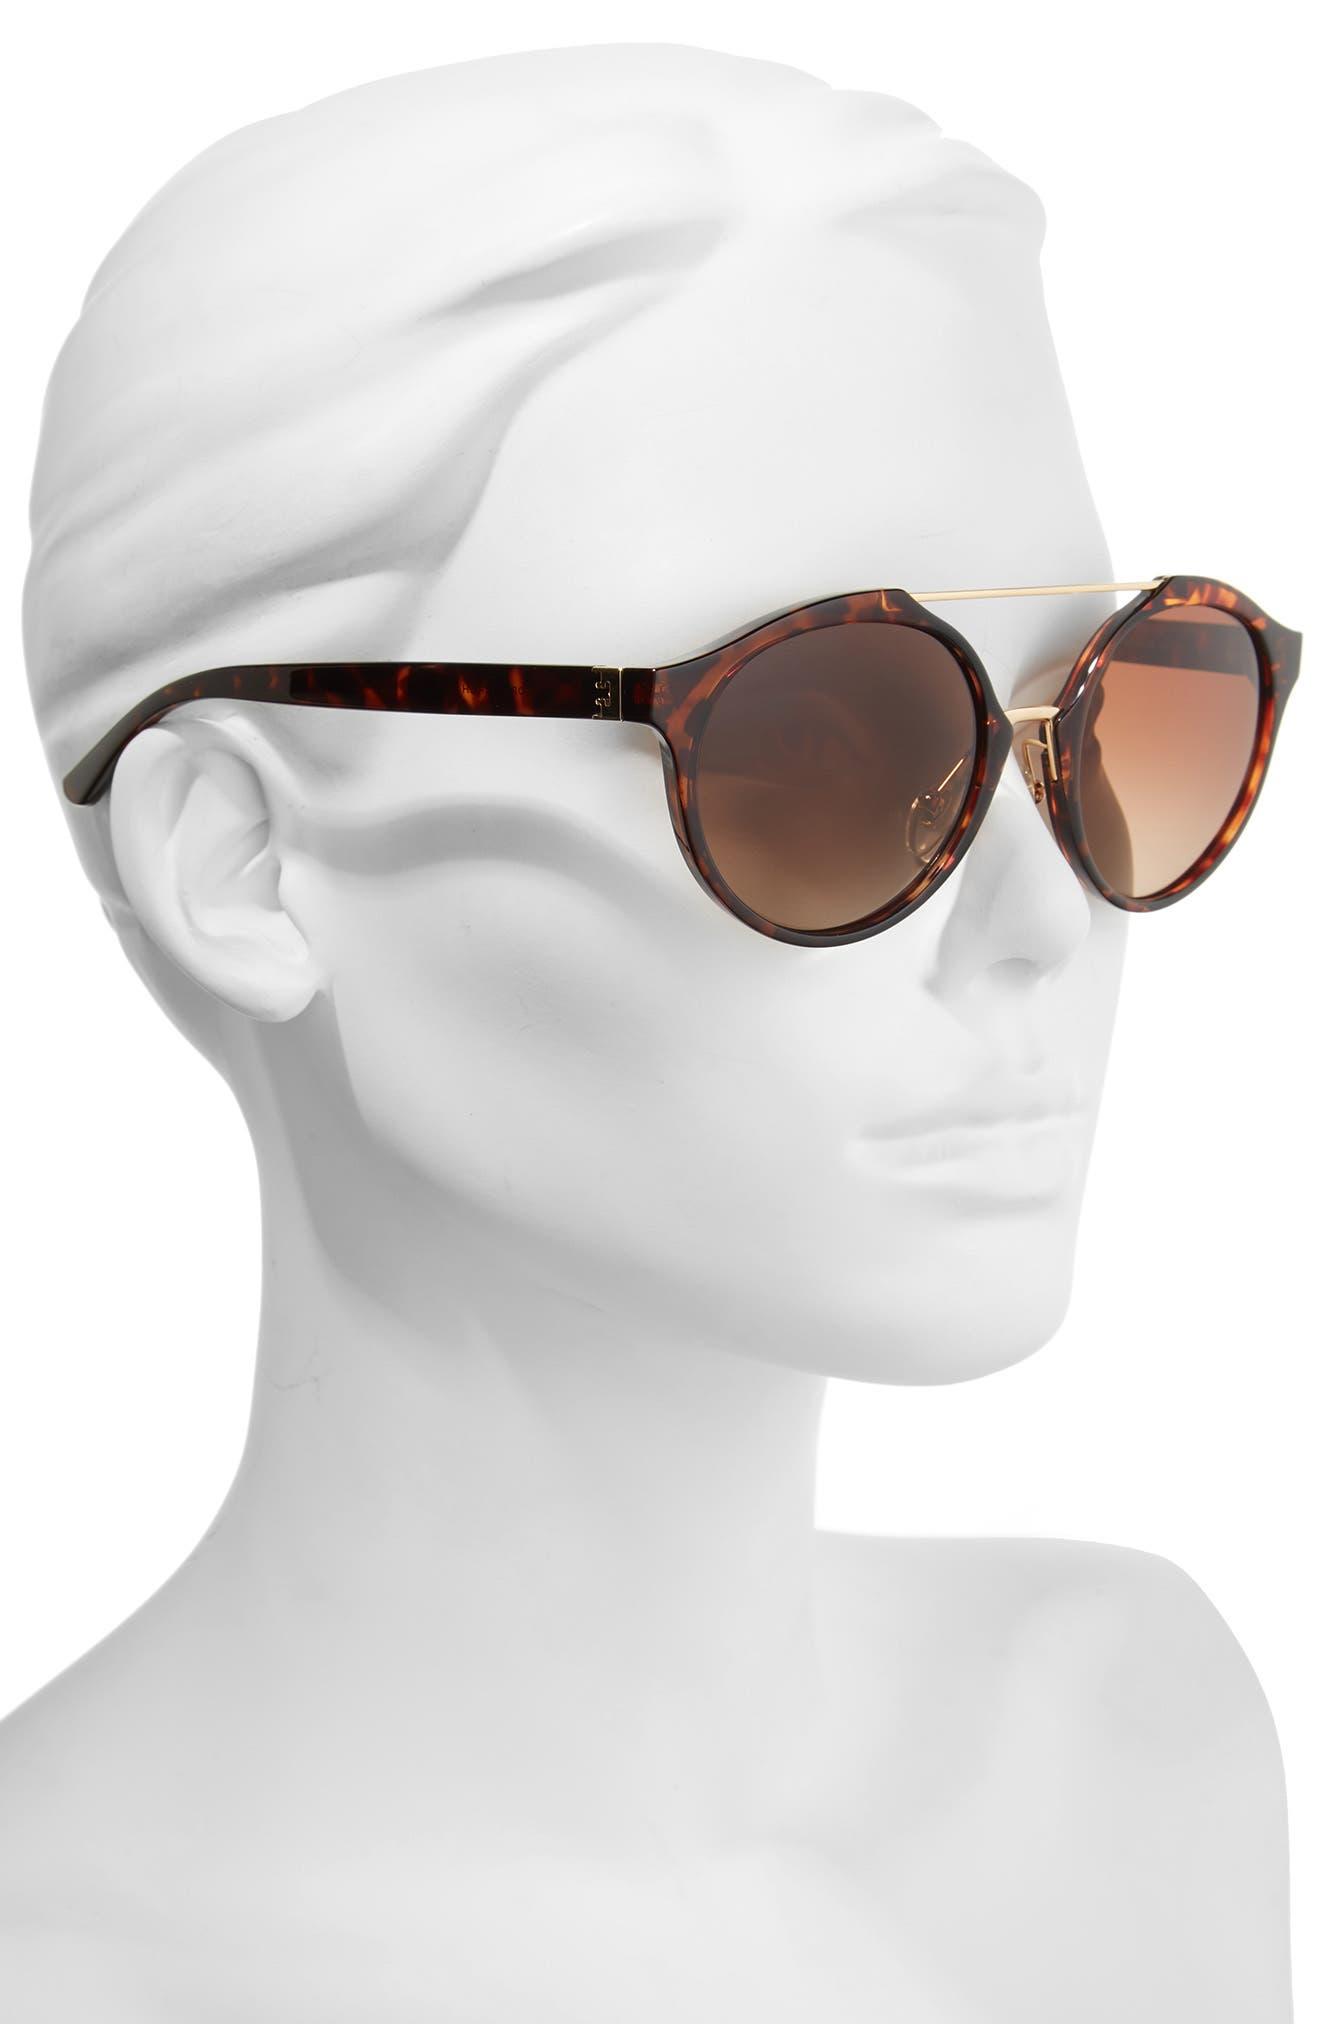 54mm Polarized Sunglasses,                             Alternate thumbnail 2, color,                             200